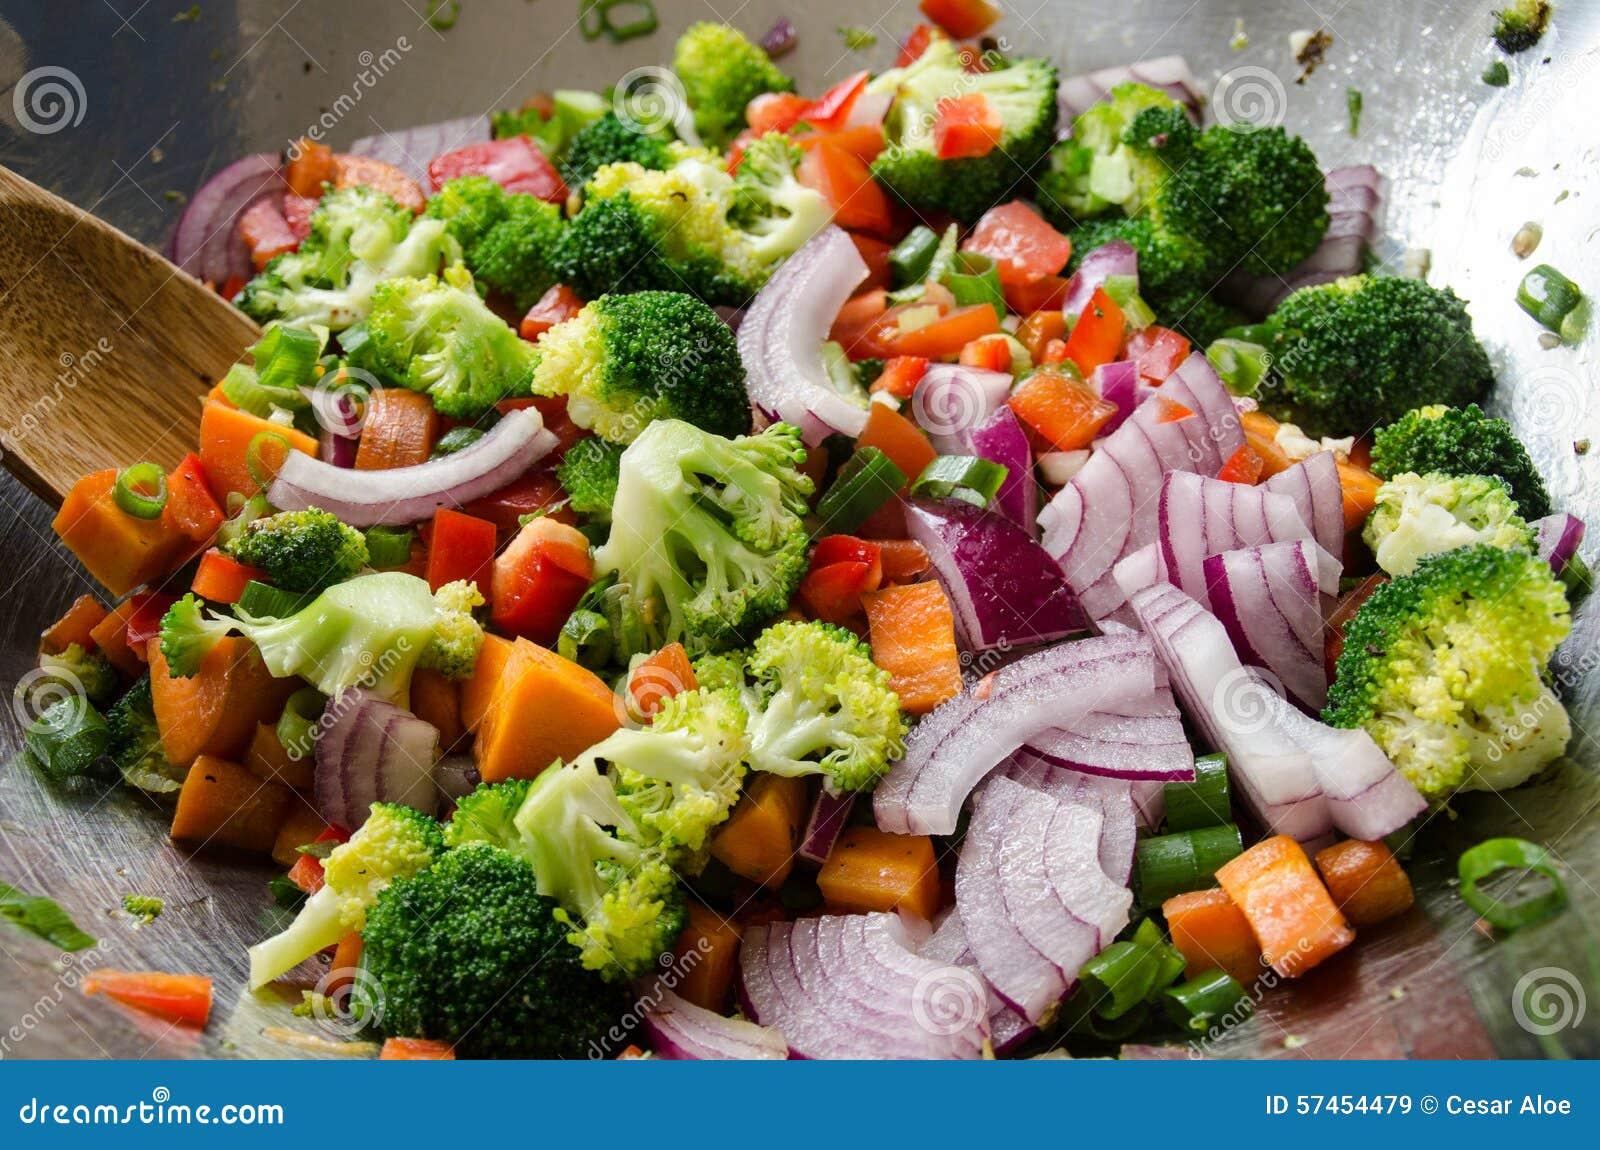 Woka veggies